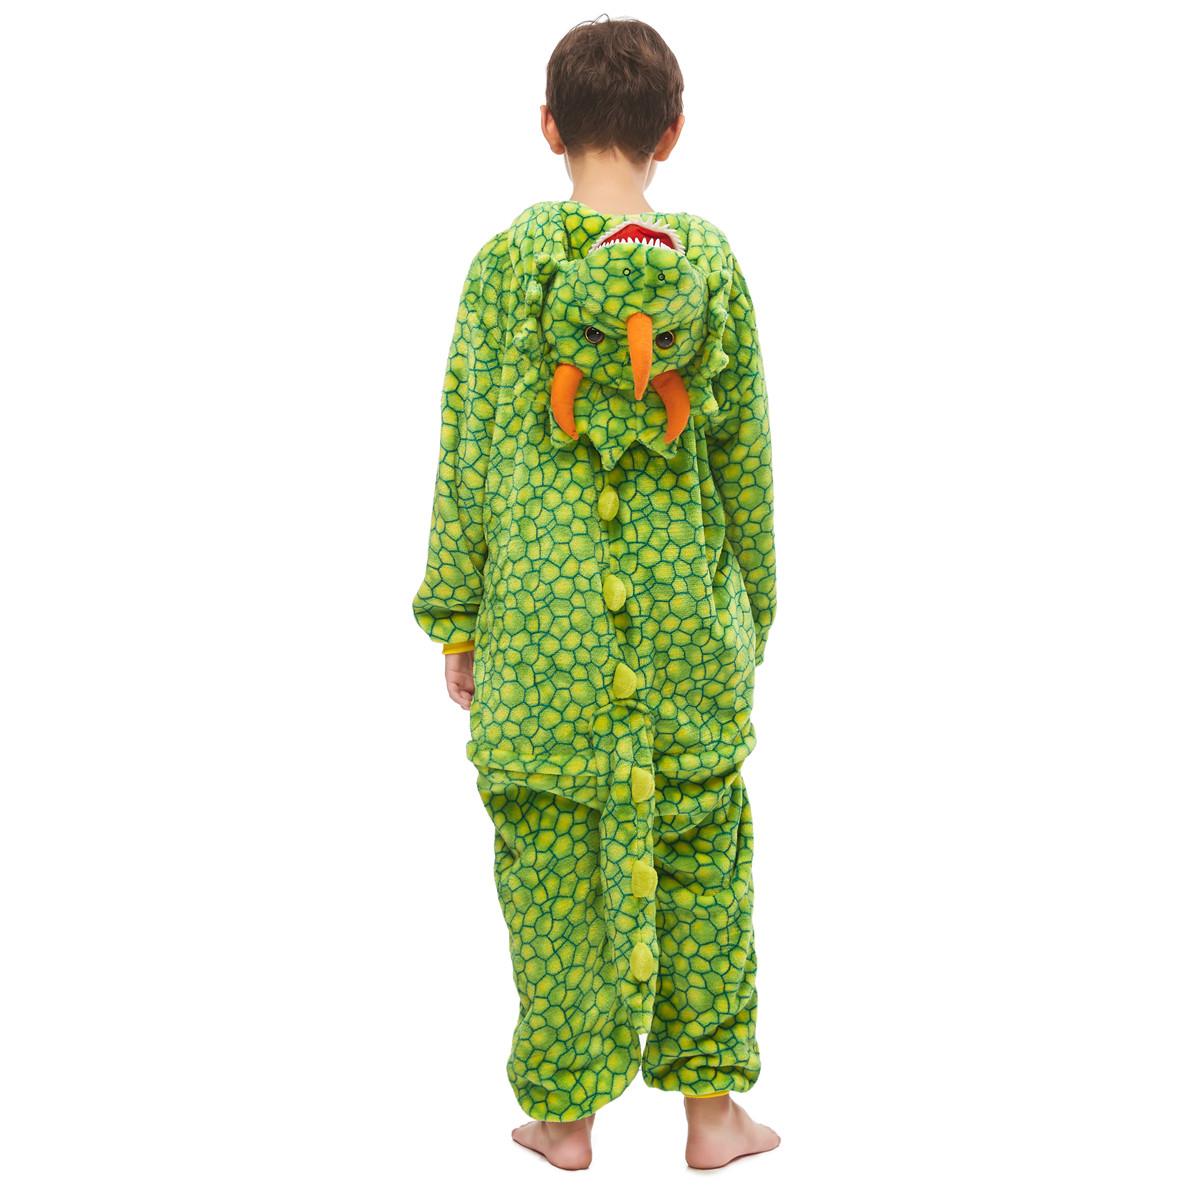 Трицератопс зеленый детский - фото Hbe3df9c4c09b458794e980578a64d1745_2fee325cbe05a439fe3a44204bed81f9.jpg